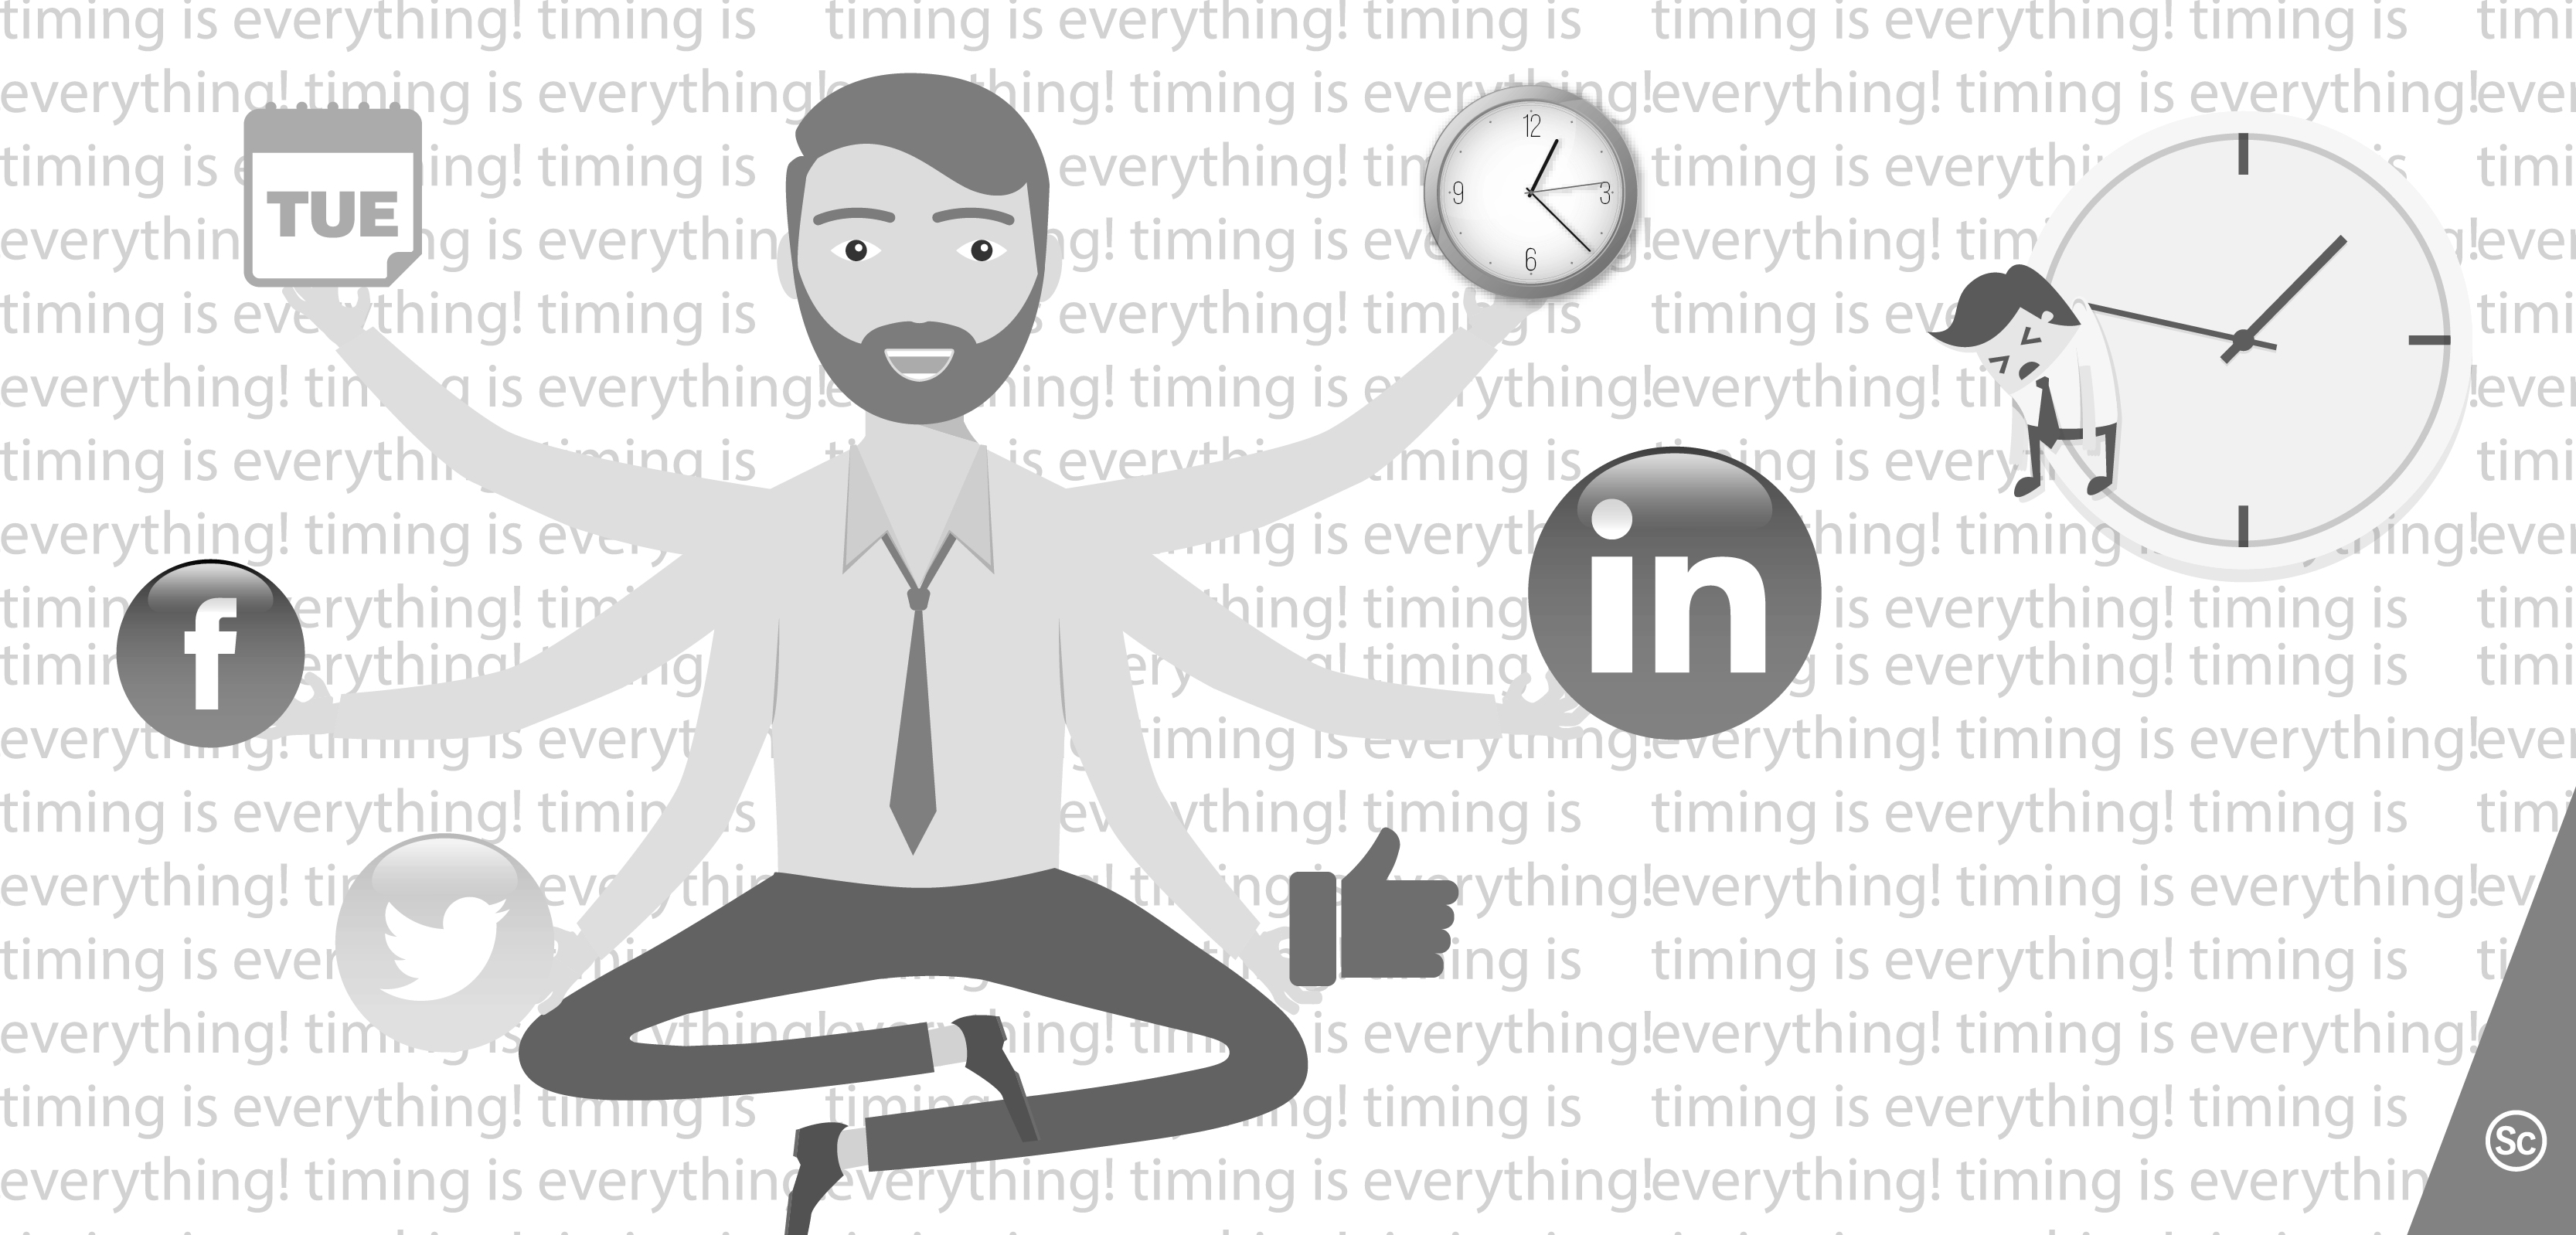 Optimize social media schedule